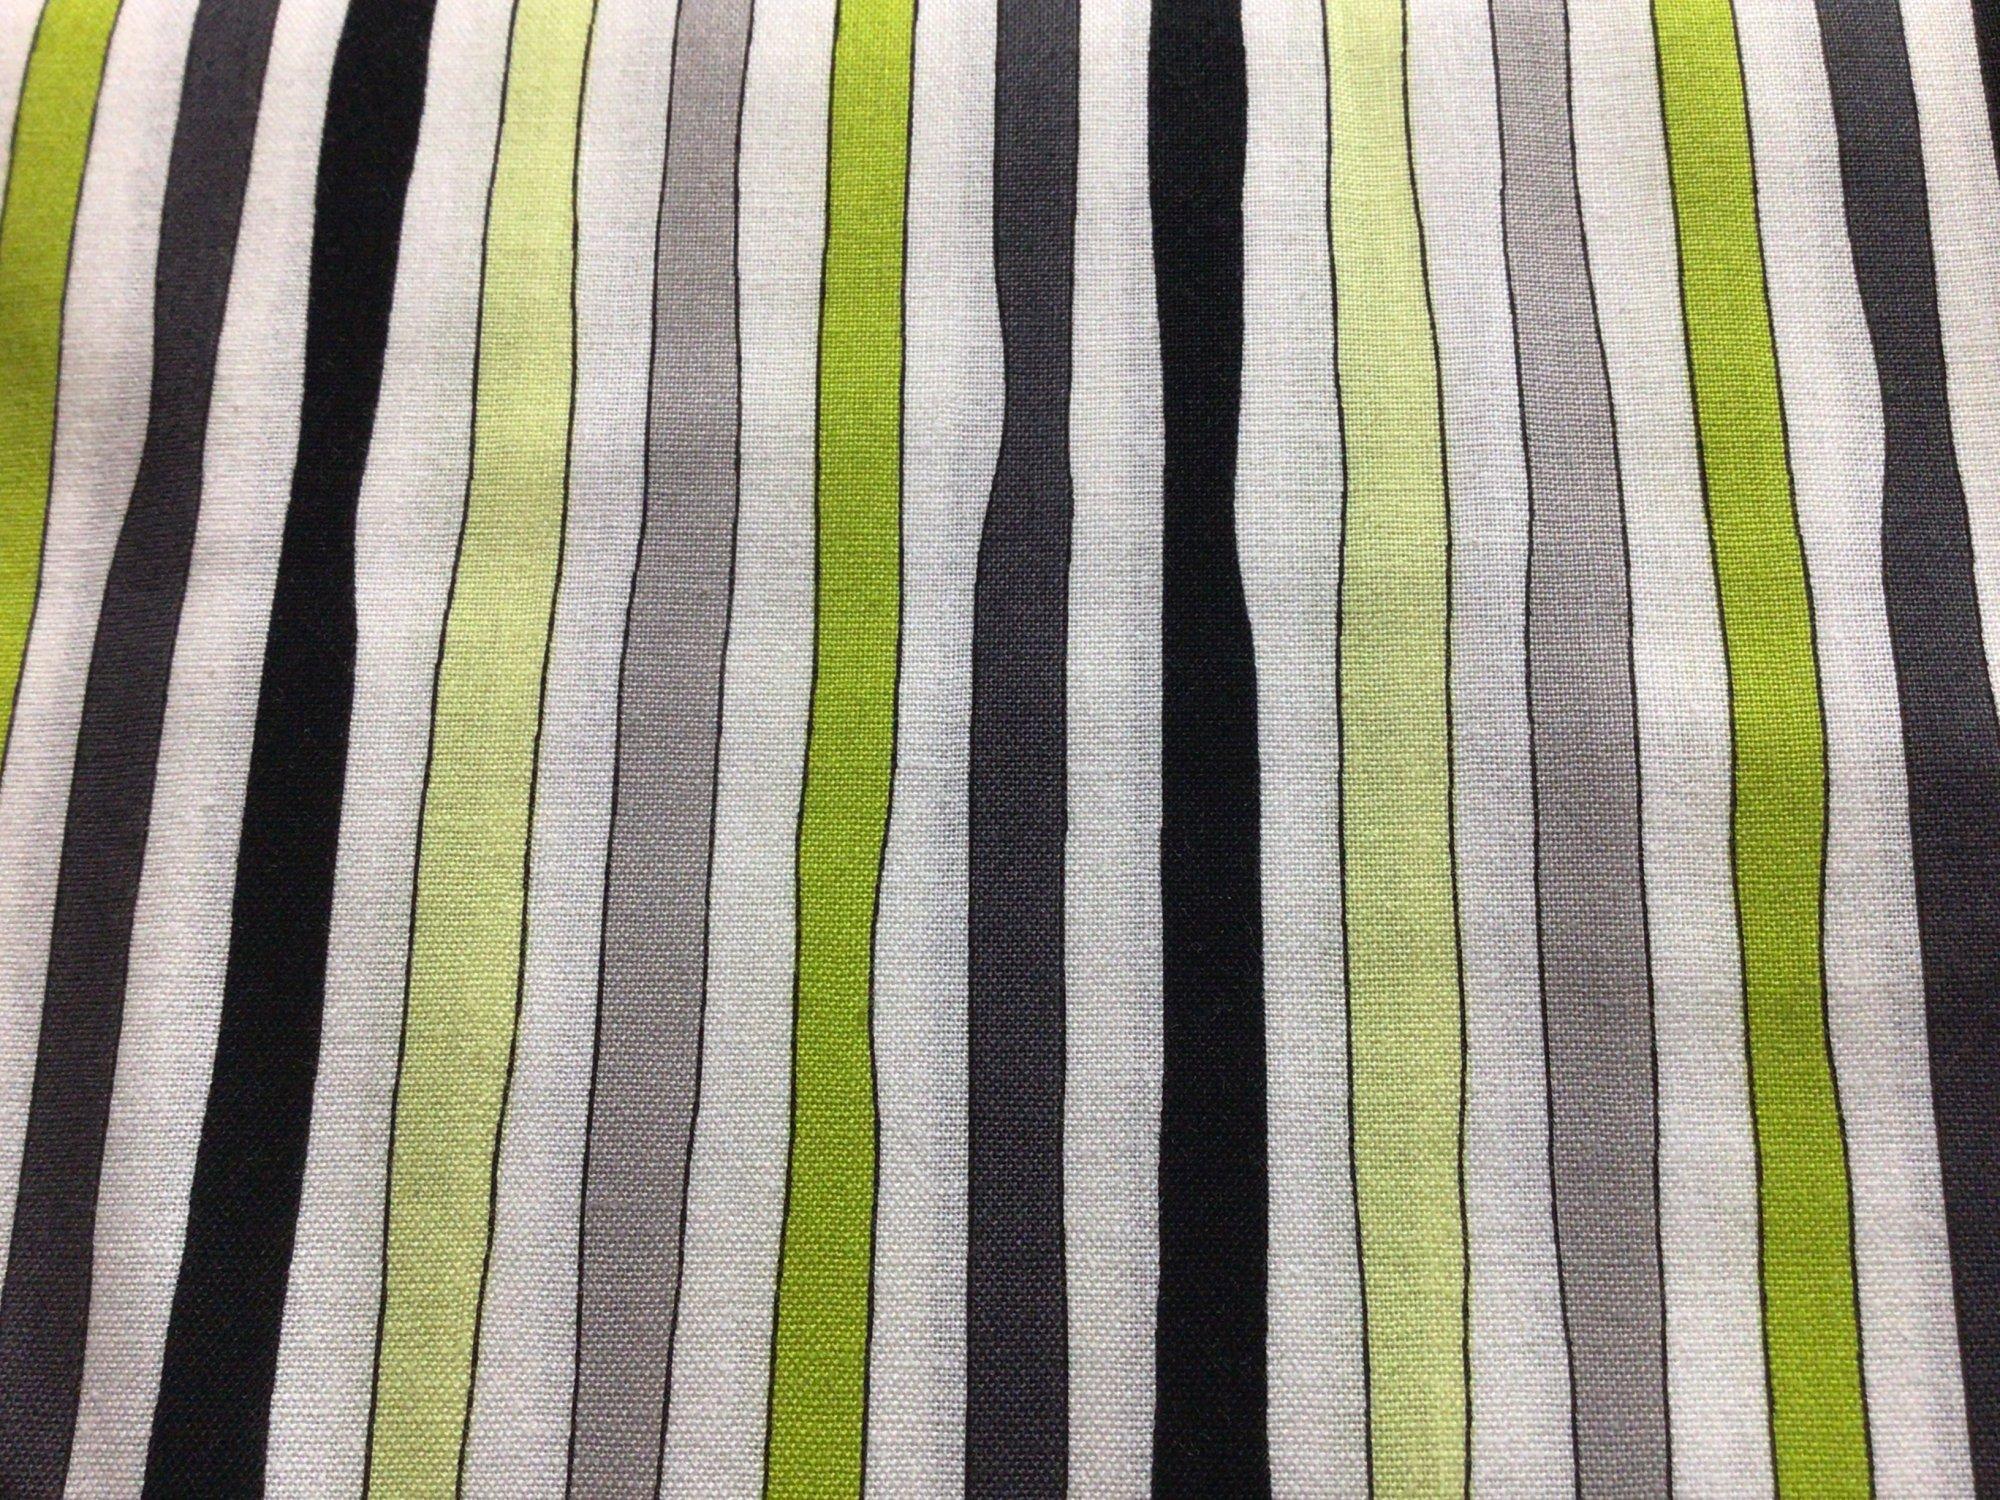 F-CB-QTR-PRO-06 Quilting Treasures-Promos-06-Stripes - White Fantasia - White/Black/Green/Grey